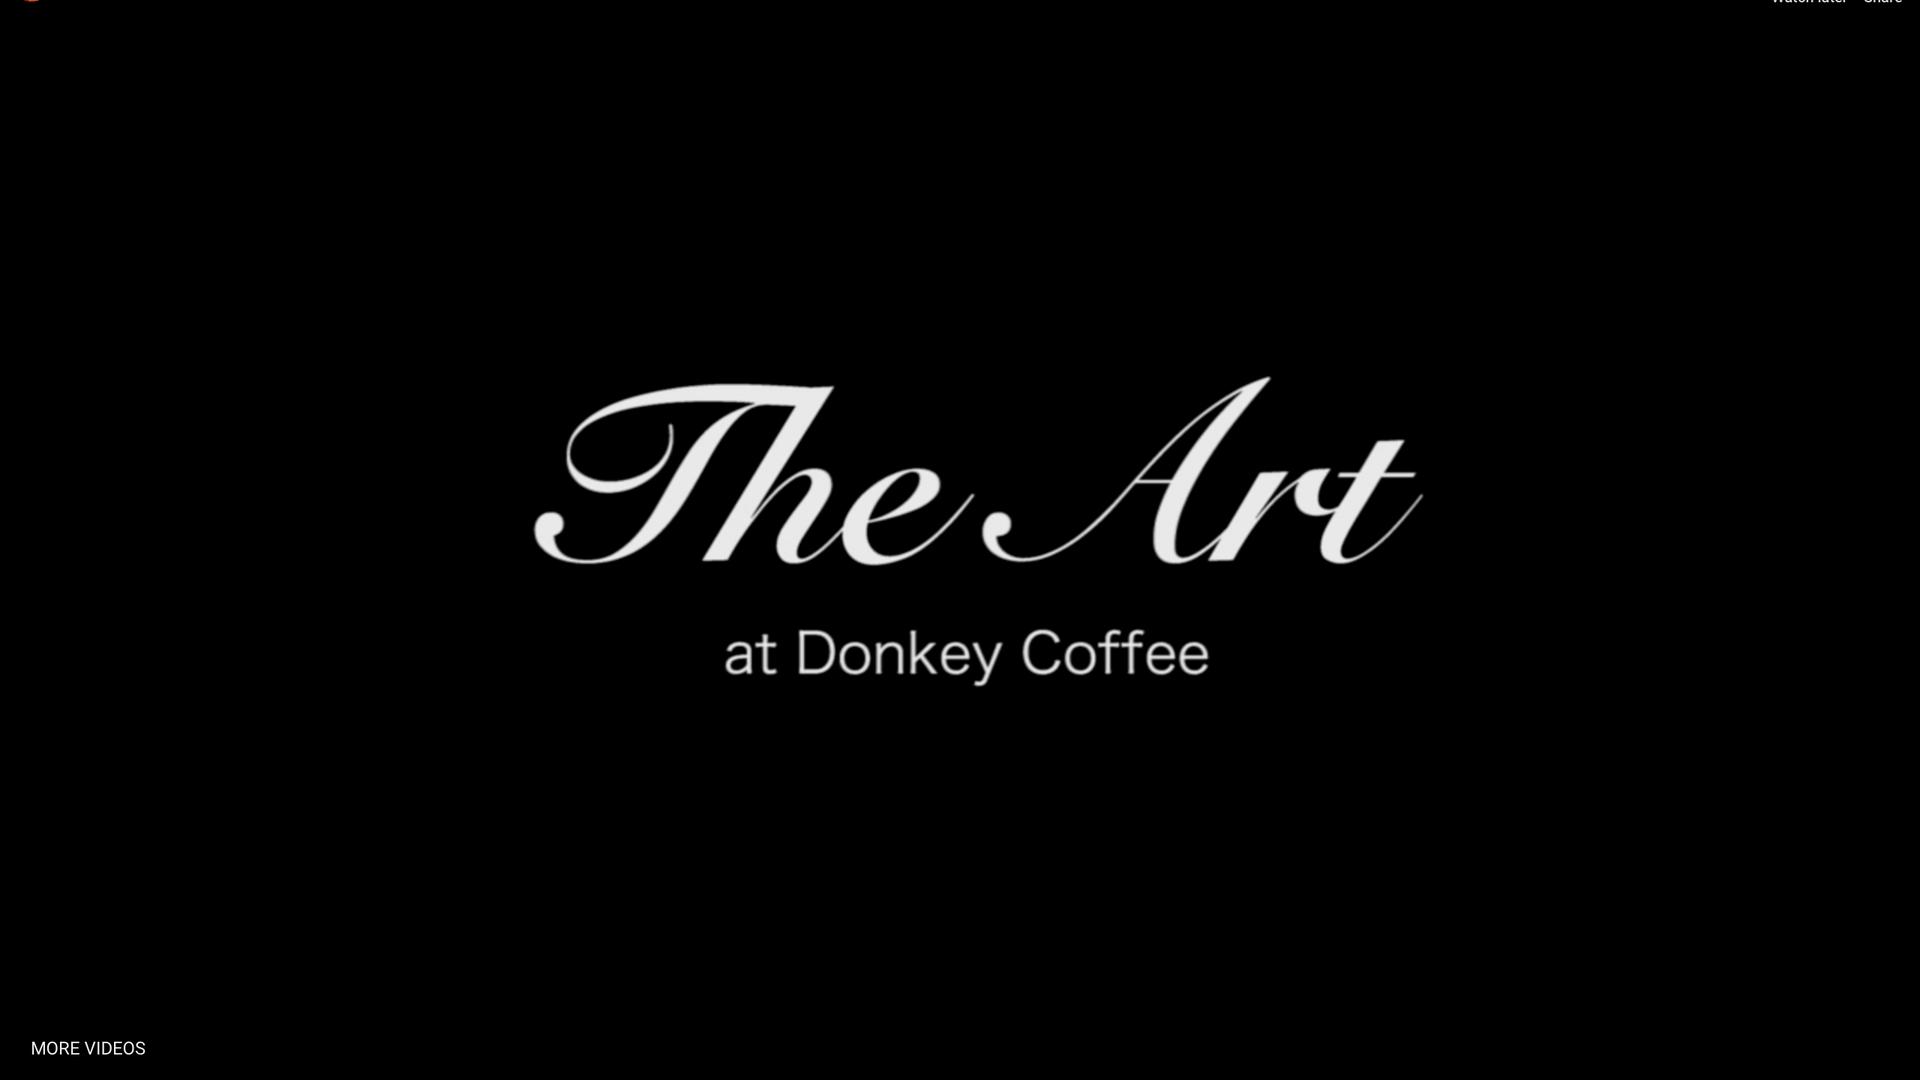 Donkey Coffee Documentary Video